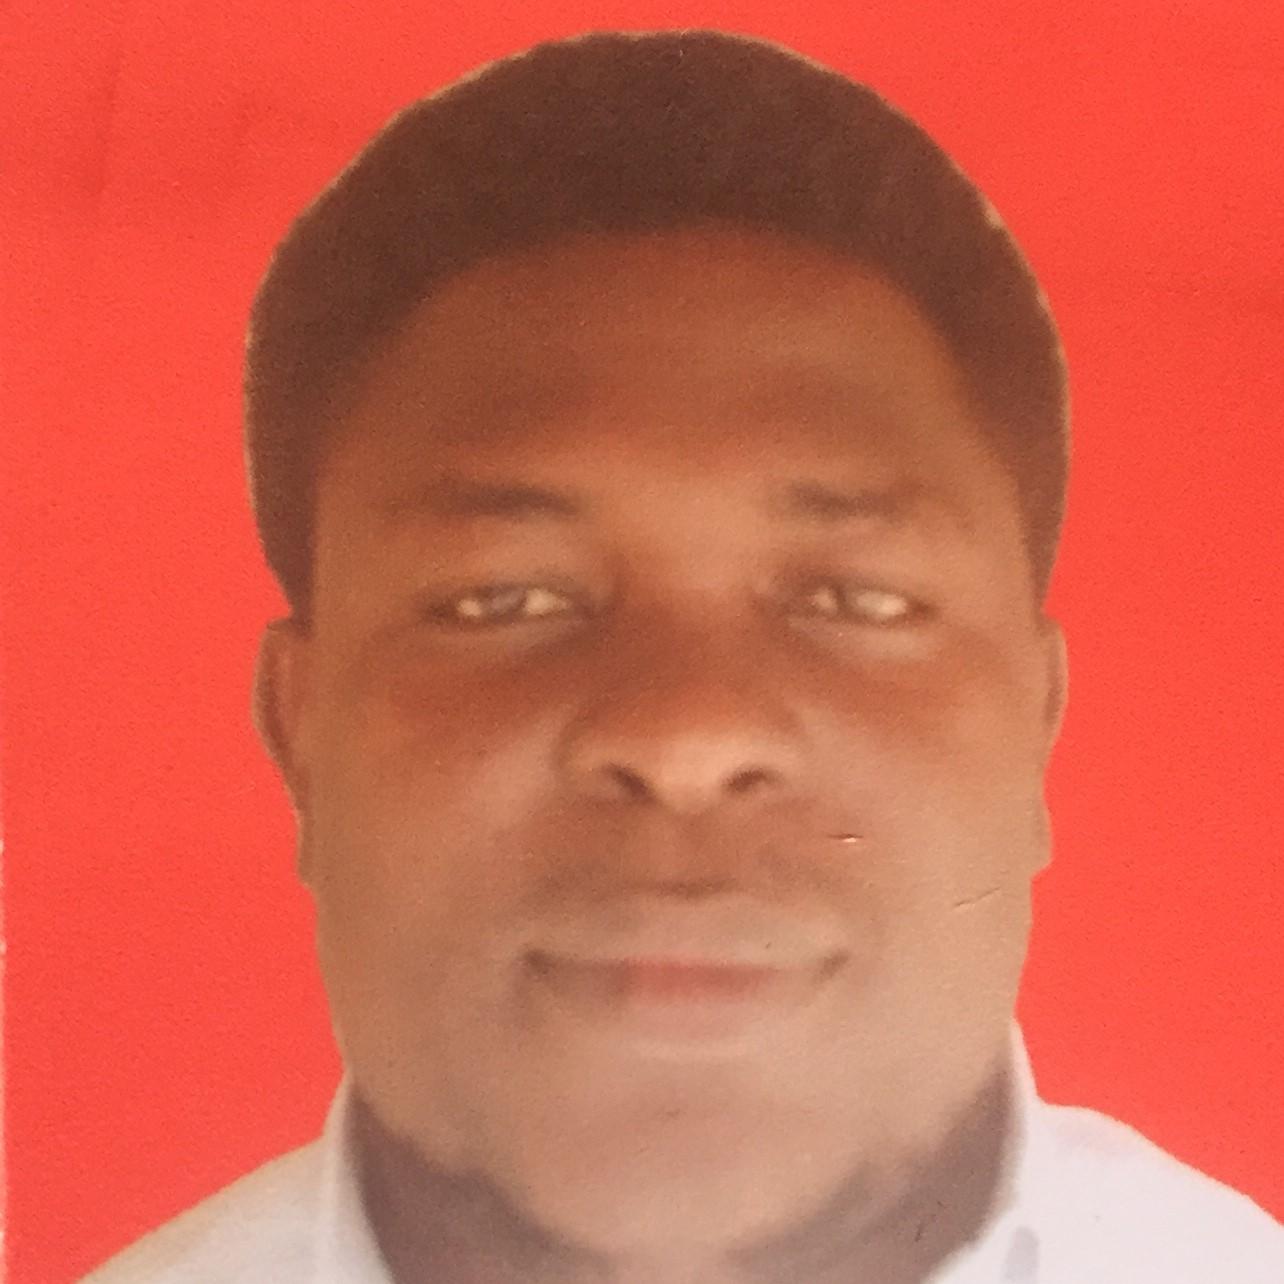 Odogun Abiodun Emmanuel